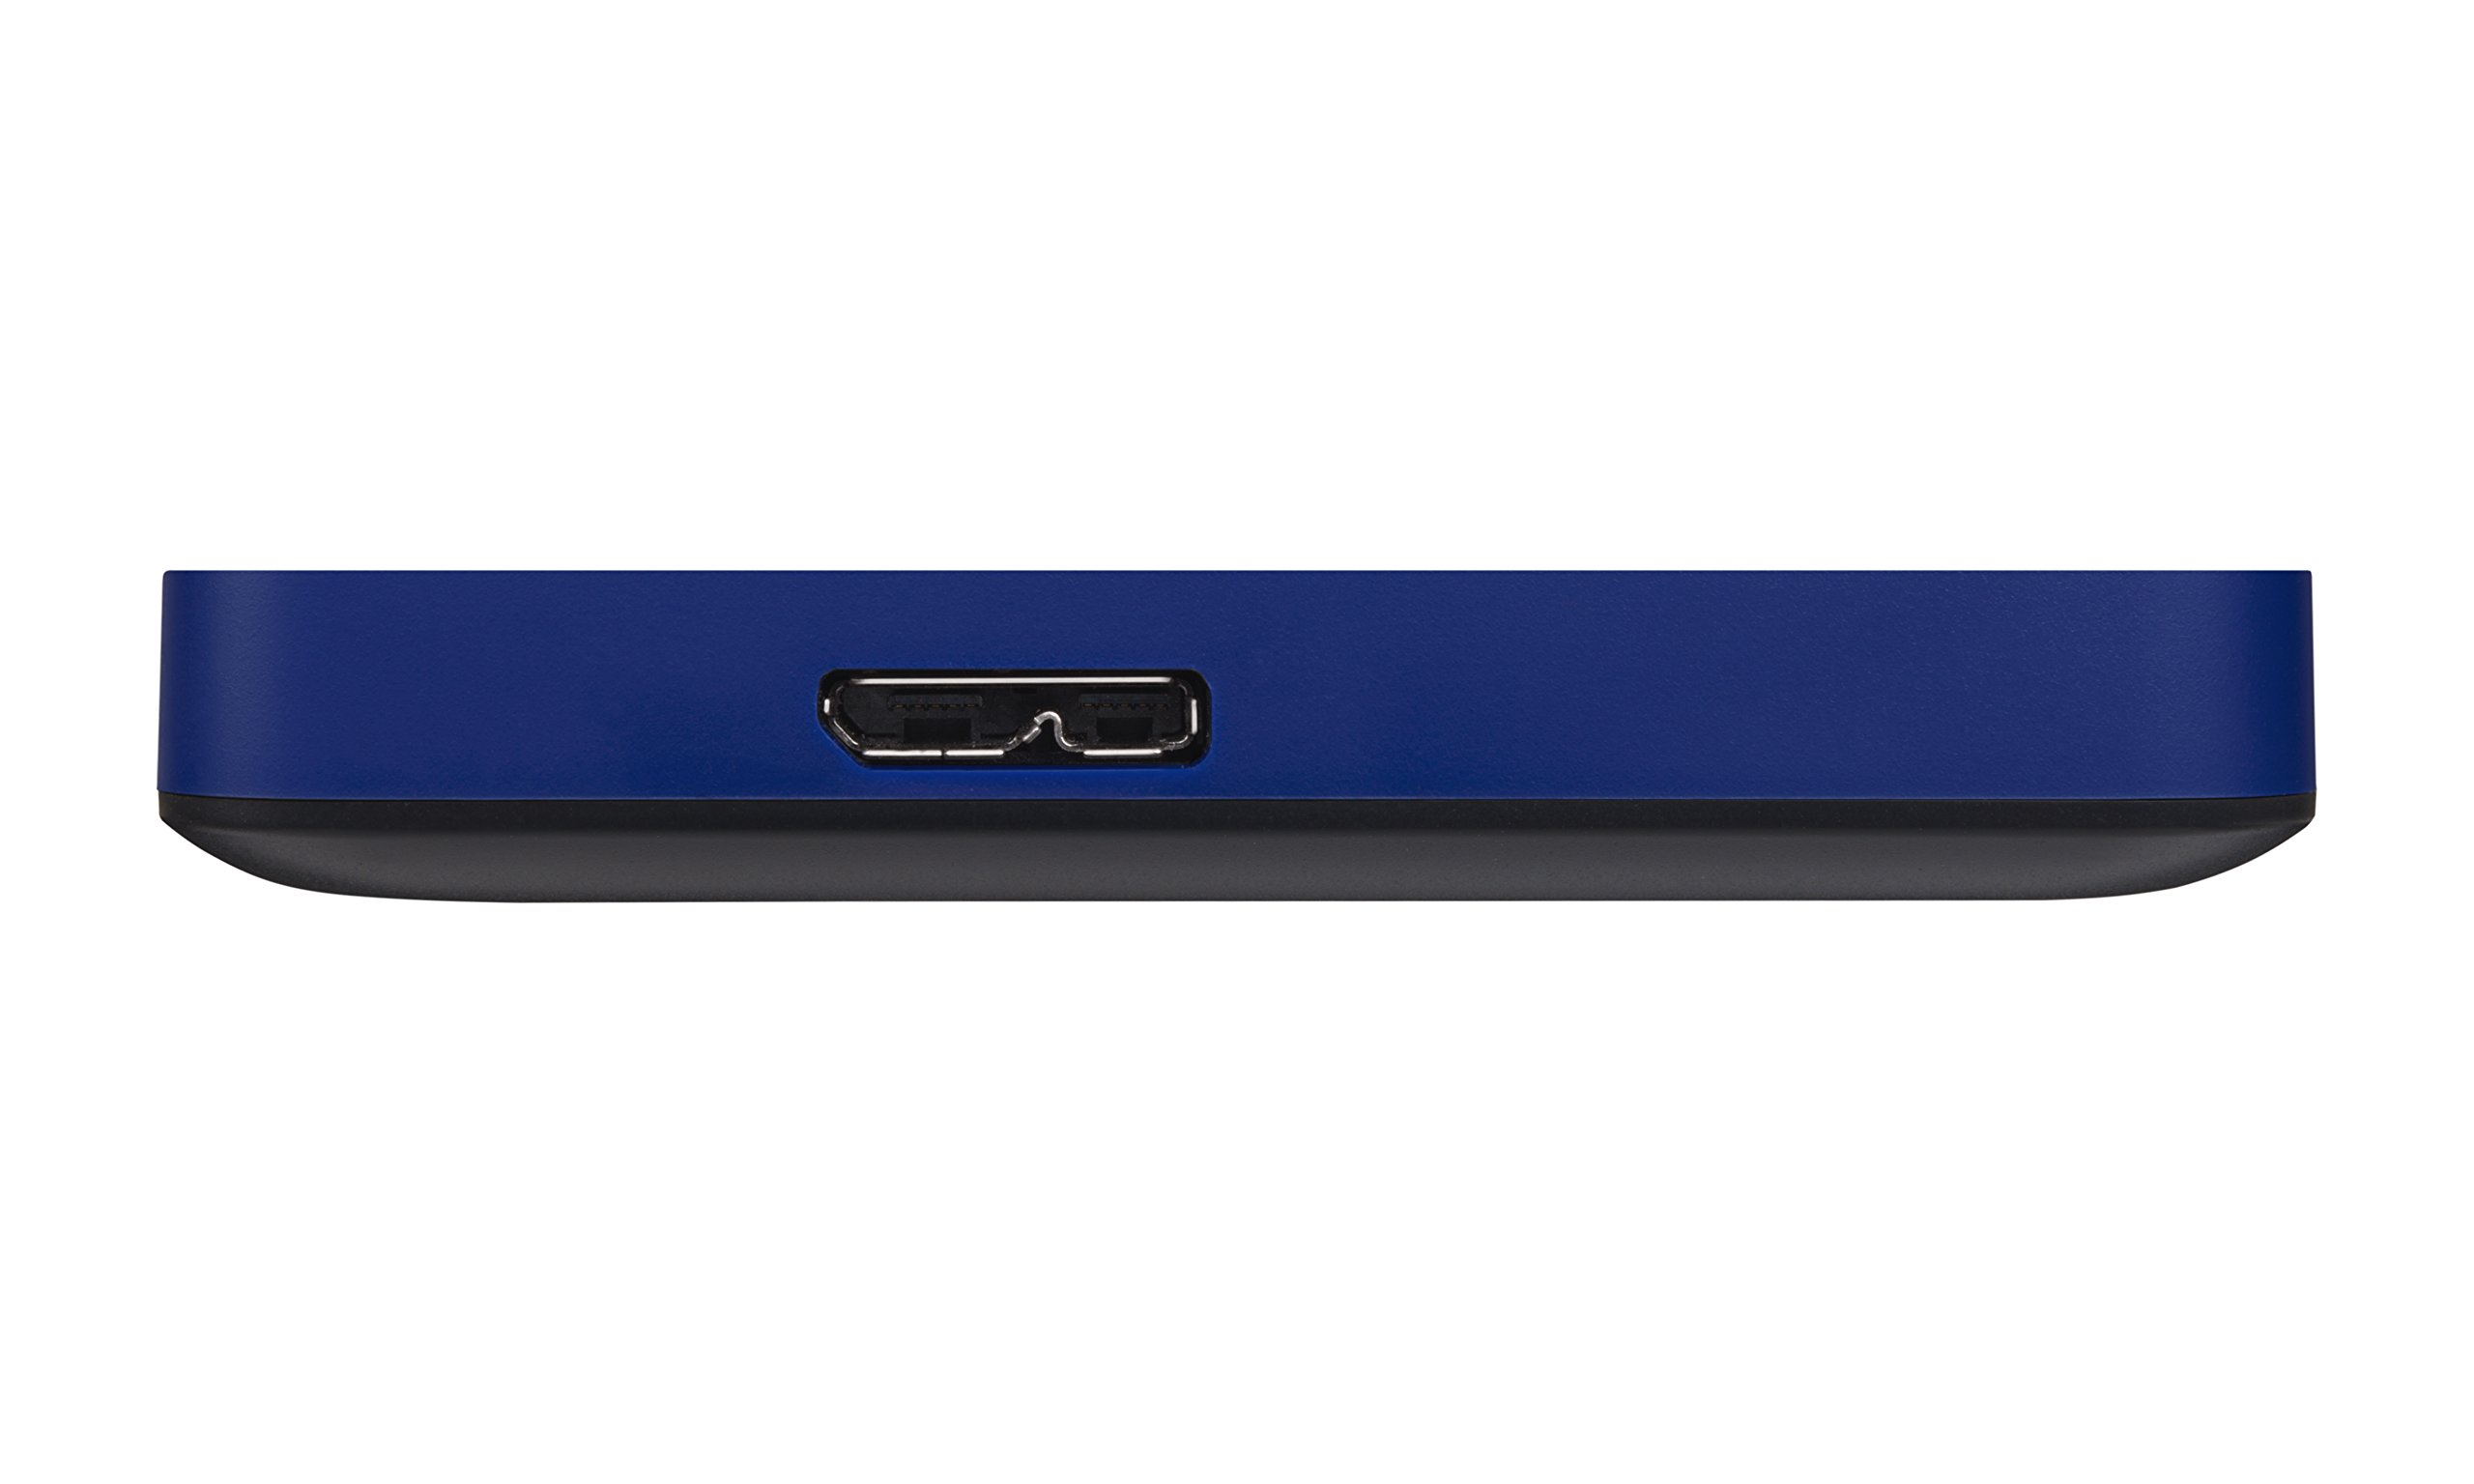 Toshiba Canvio Advance 1TB Portable External Hard Drive USB 3.0, Blue (HDTC910XL3AA) by Toshiba (Image #5)